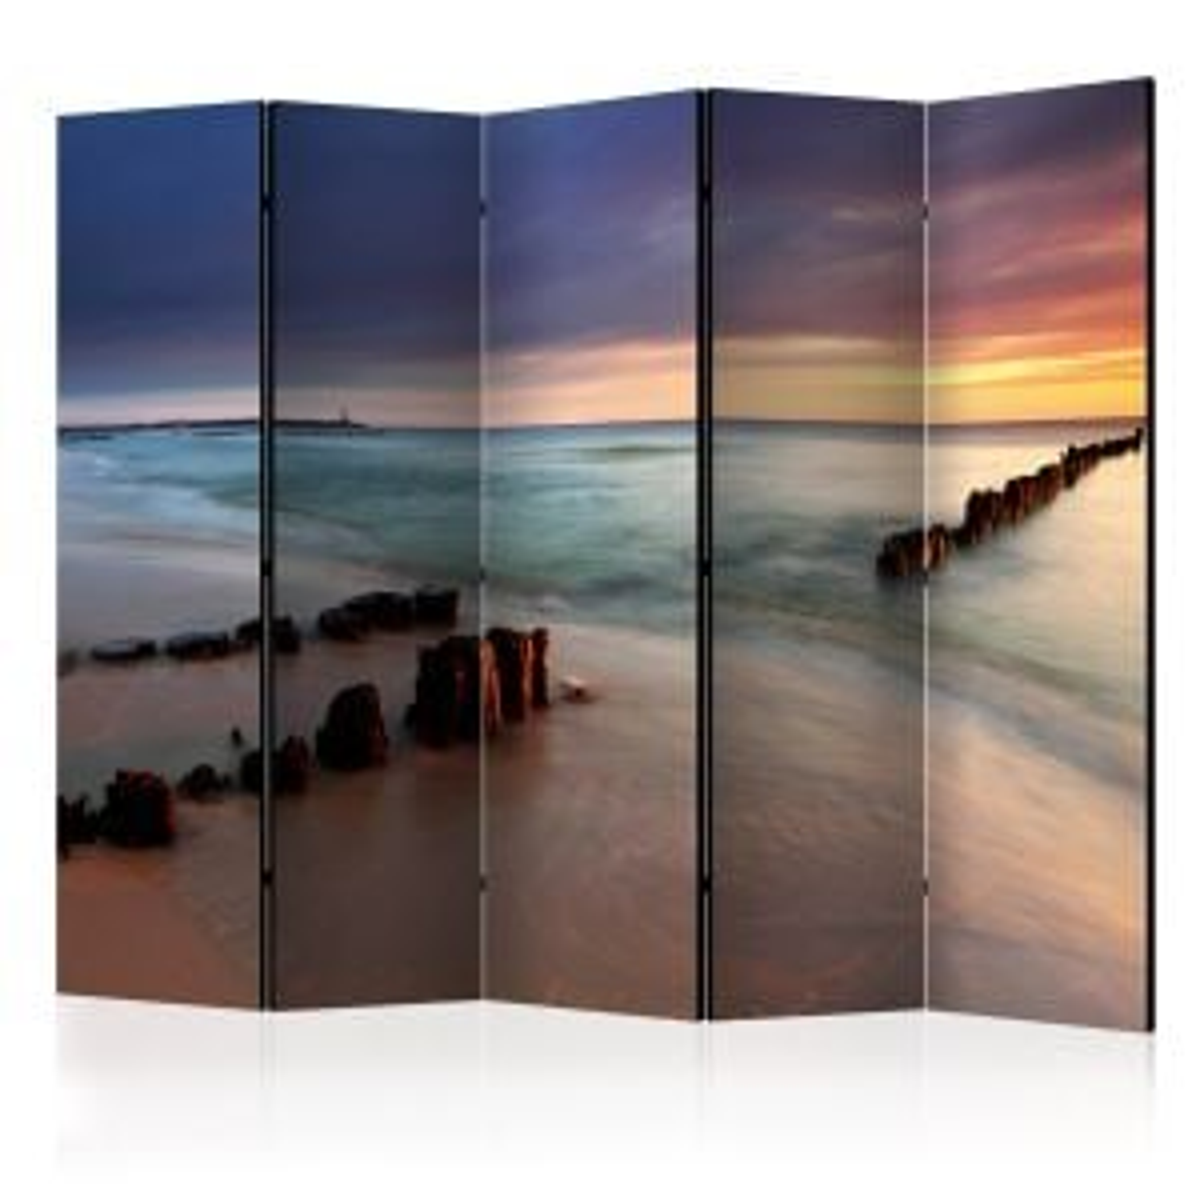 Parawan 5-częściowy - Plaża - wschód słońca II [Room Dividers]